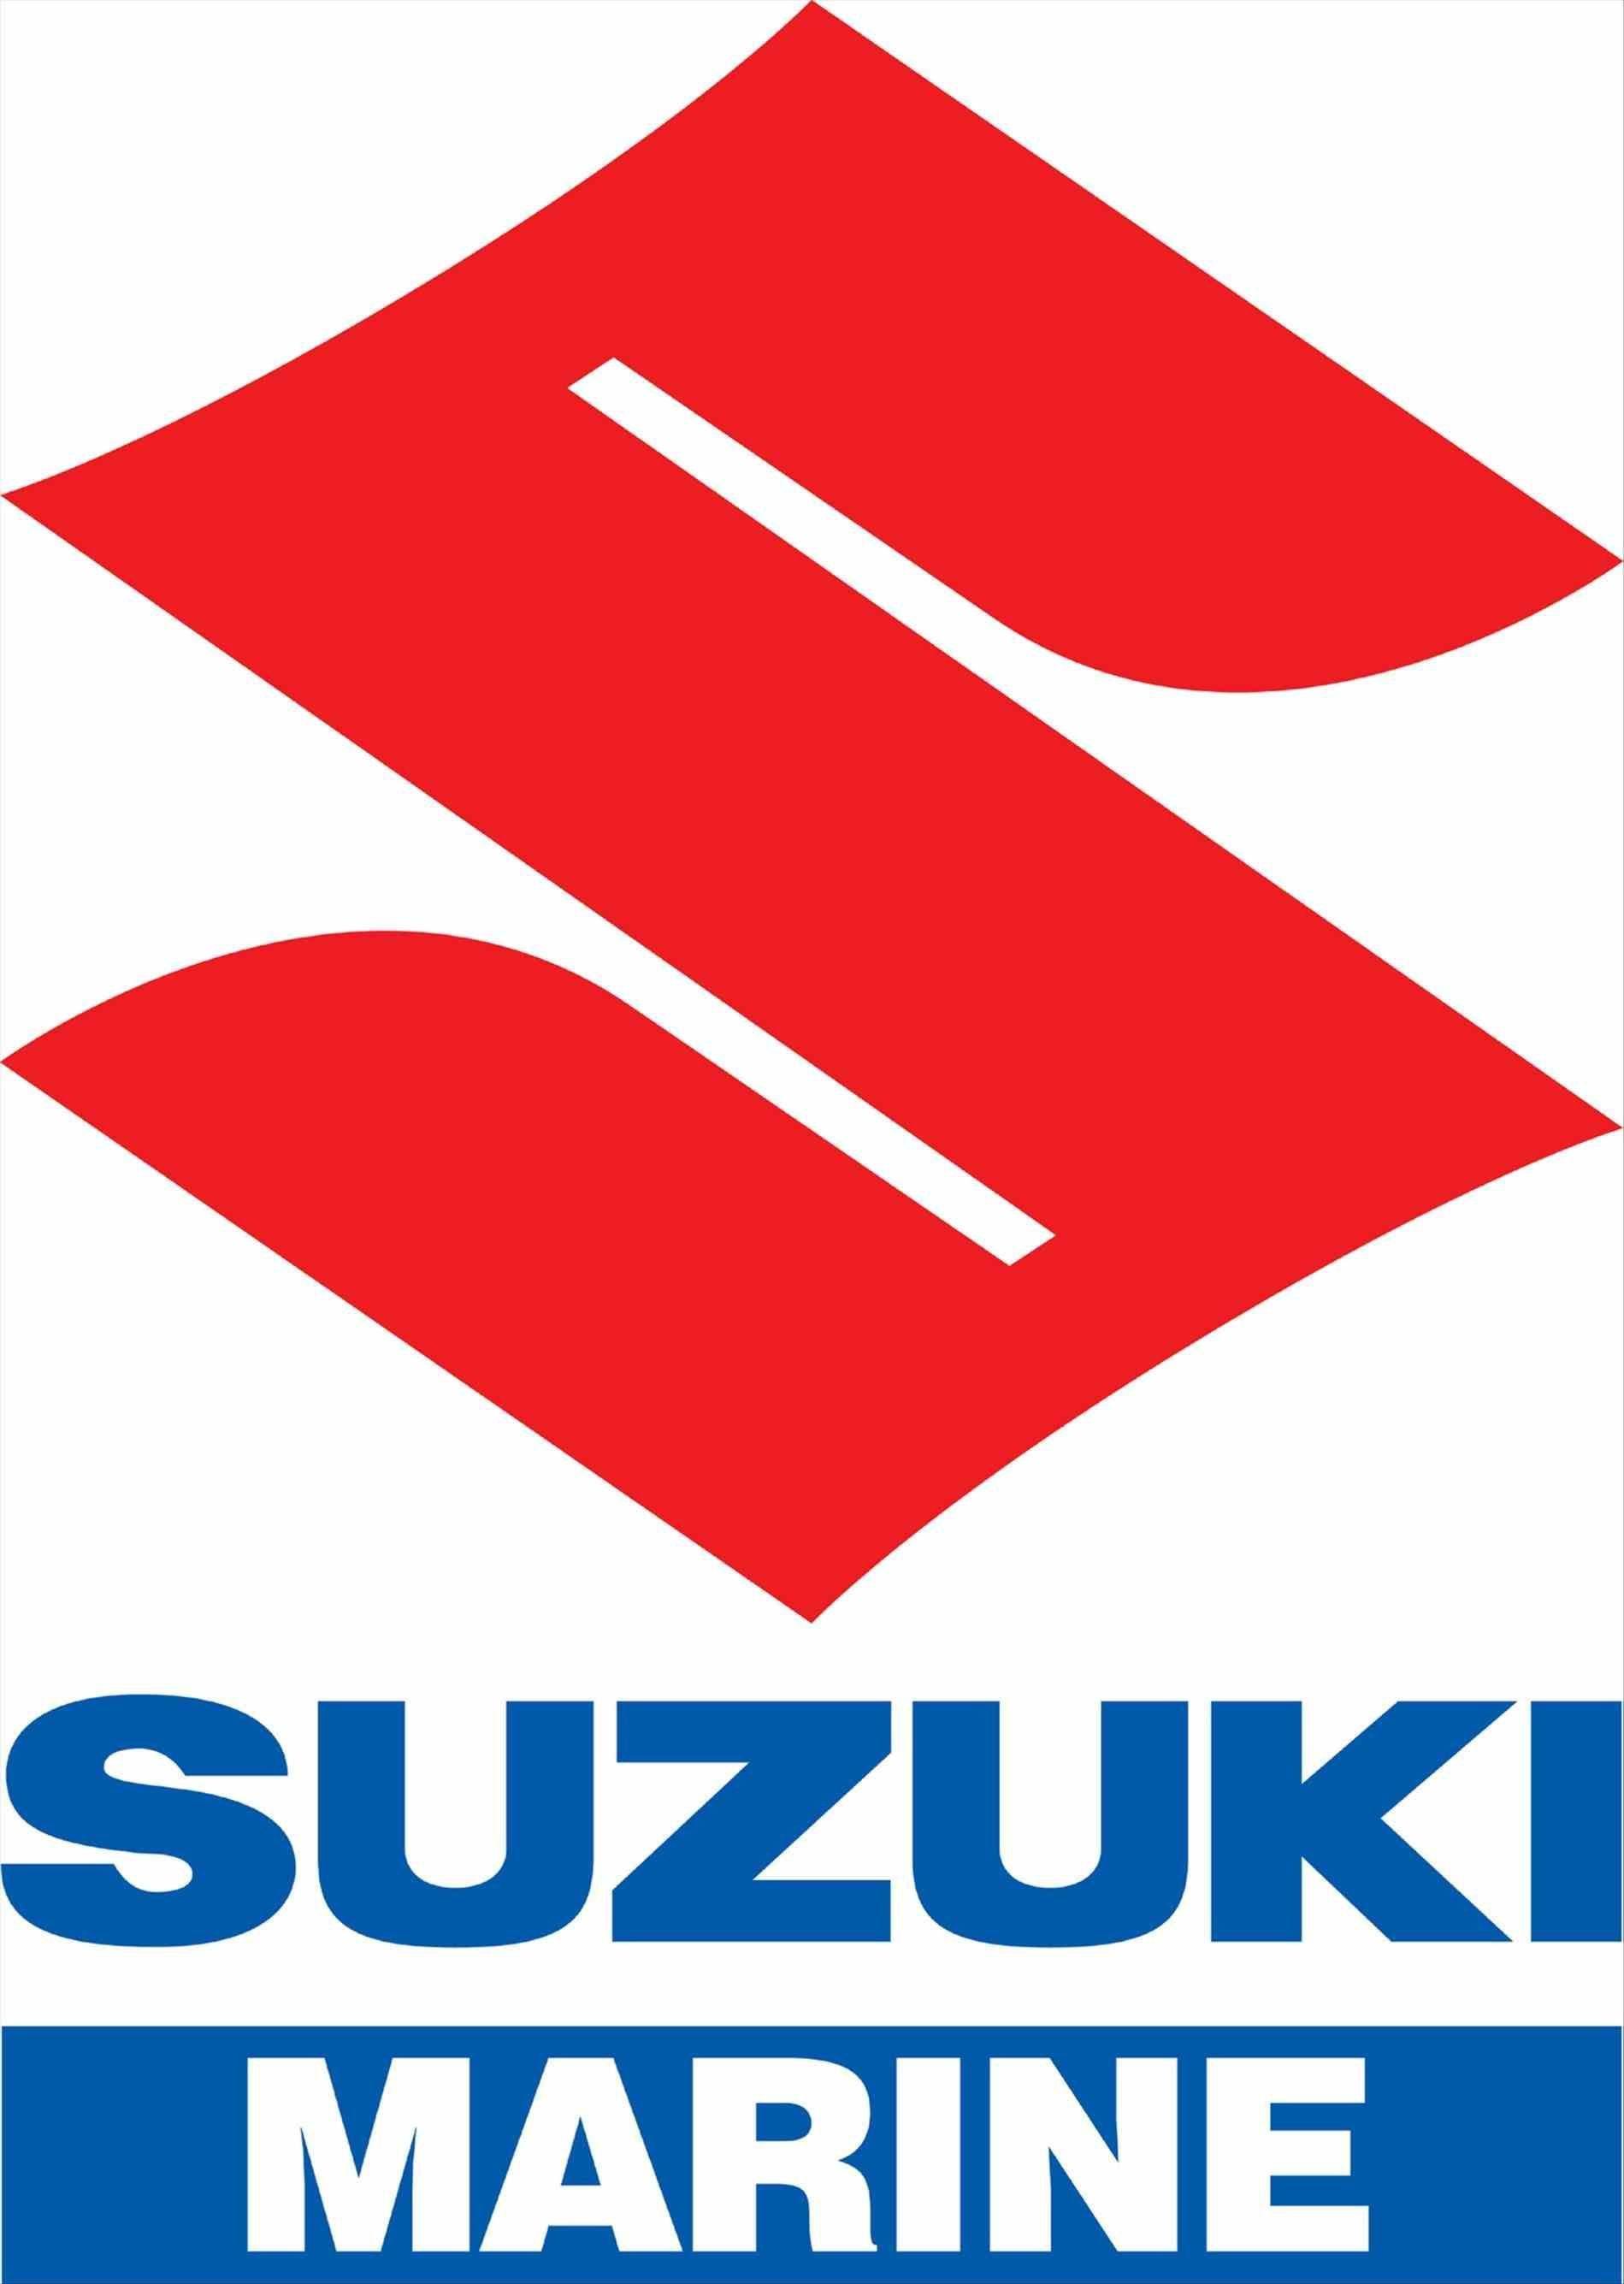 Suzuki Kamaksel